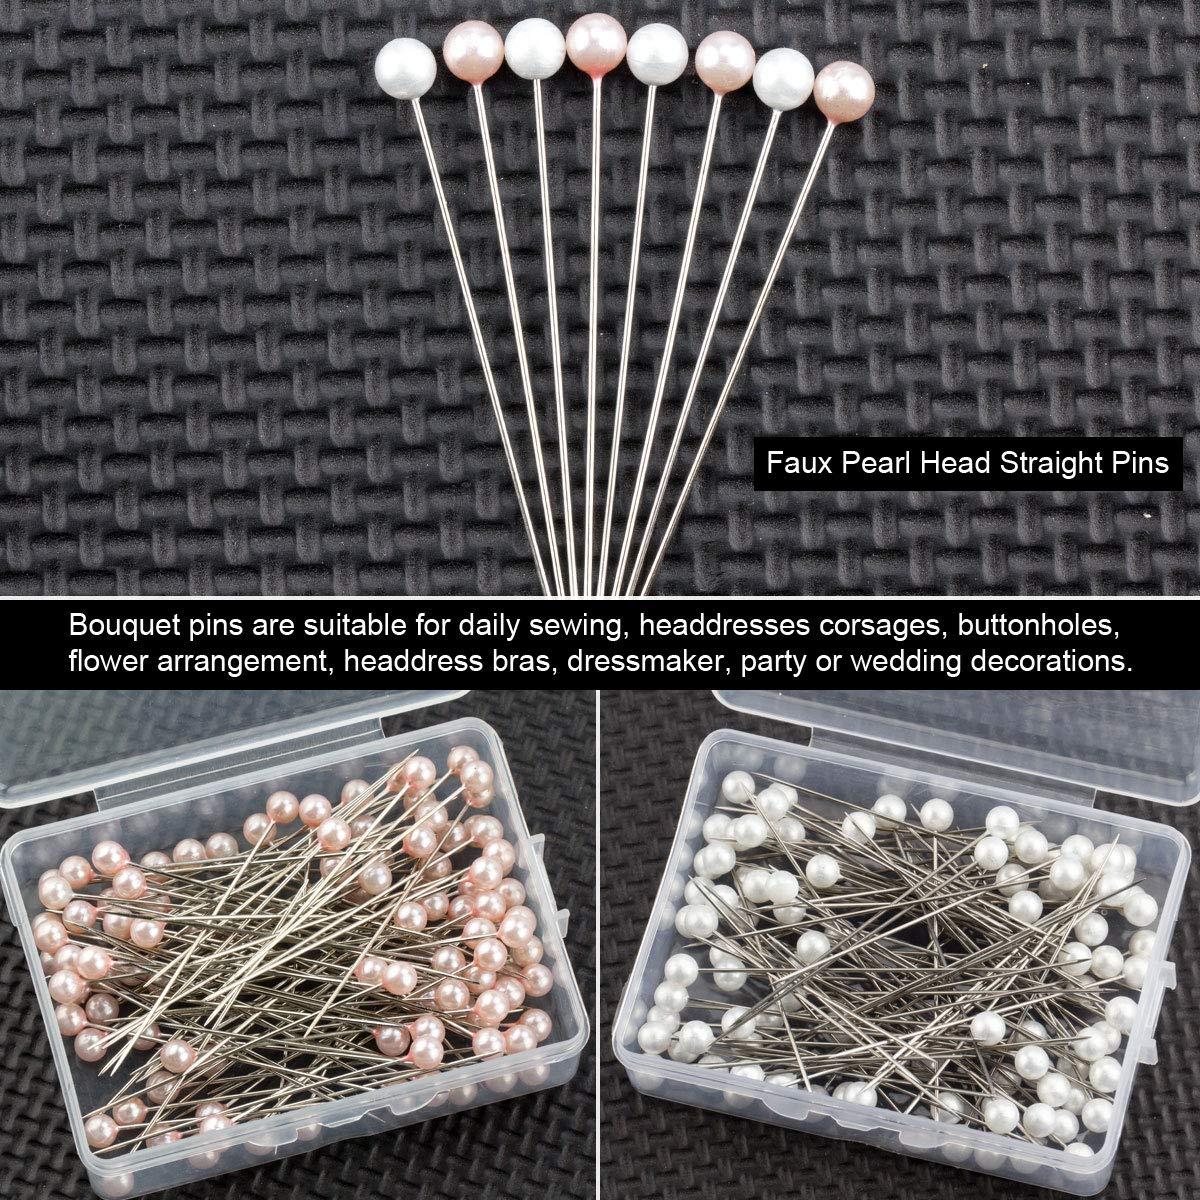 HNBun 200 PCS 2.5 Long Straight Pins Round Headed Pins Corsage Pins Bouquet Pins Ball Head Pins Flower Pins for DIY Sewing Crafts 100 PCS Each of White Pink